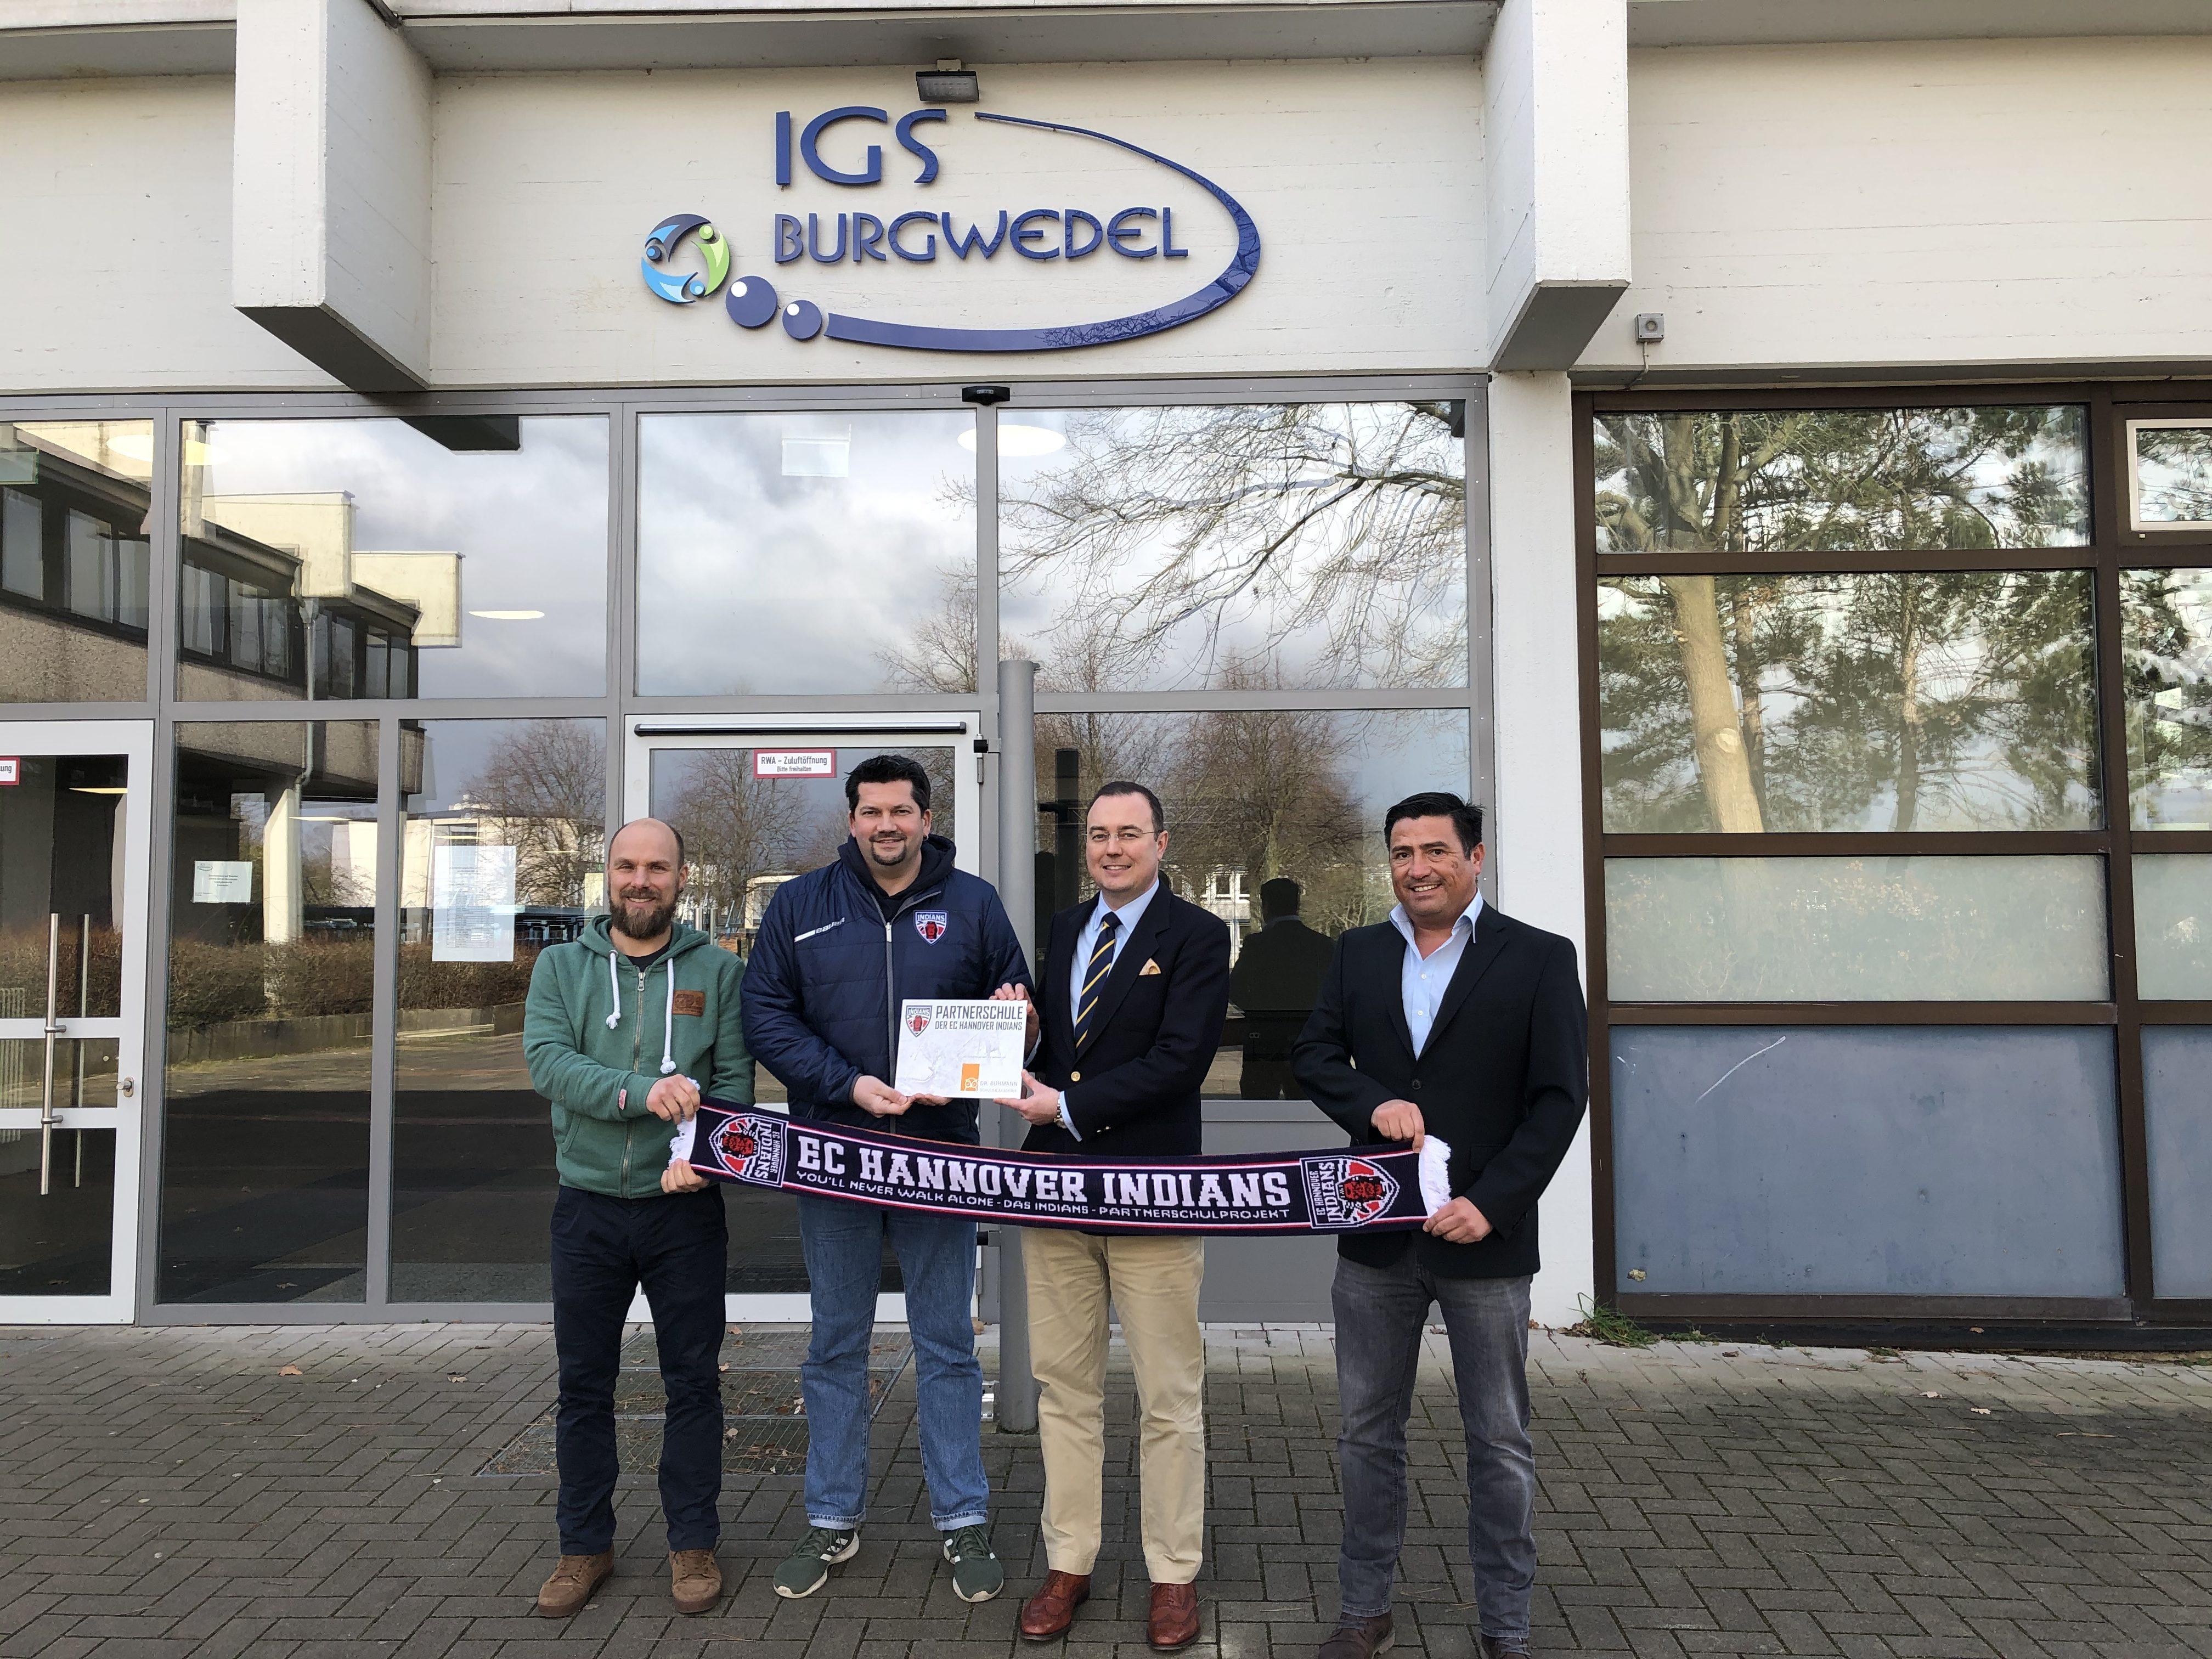 IGS Burgwedel ist jetzt Partnerschule der Hannover Indians